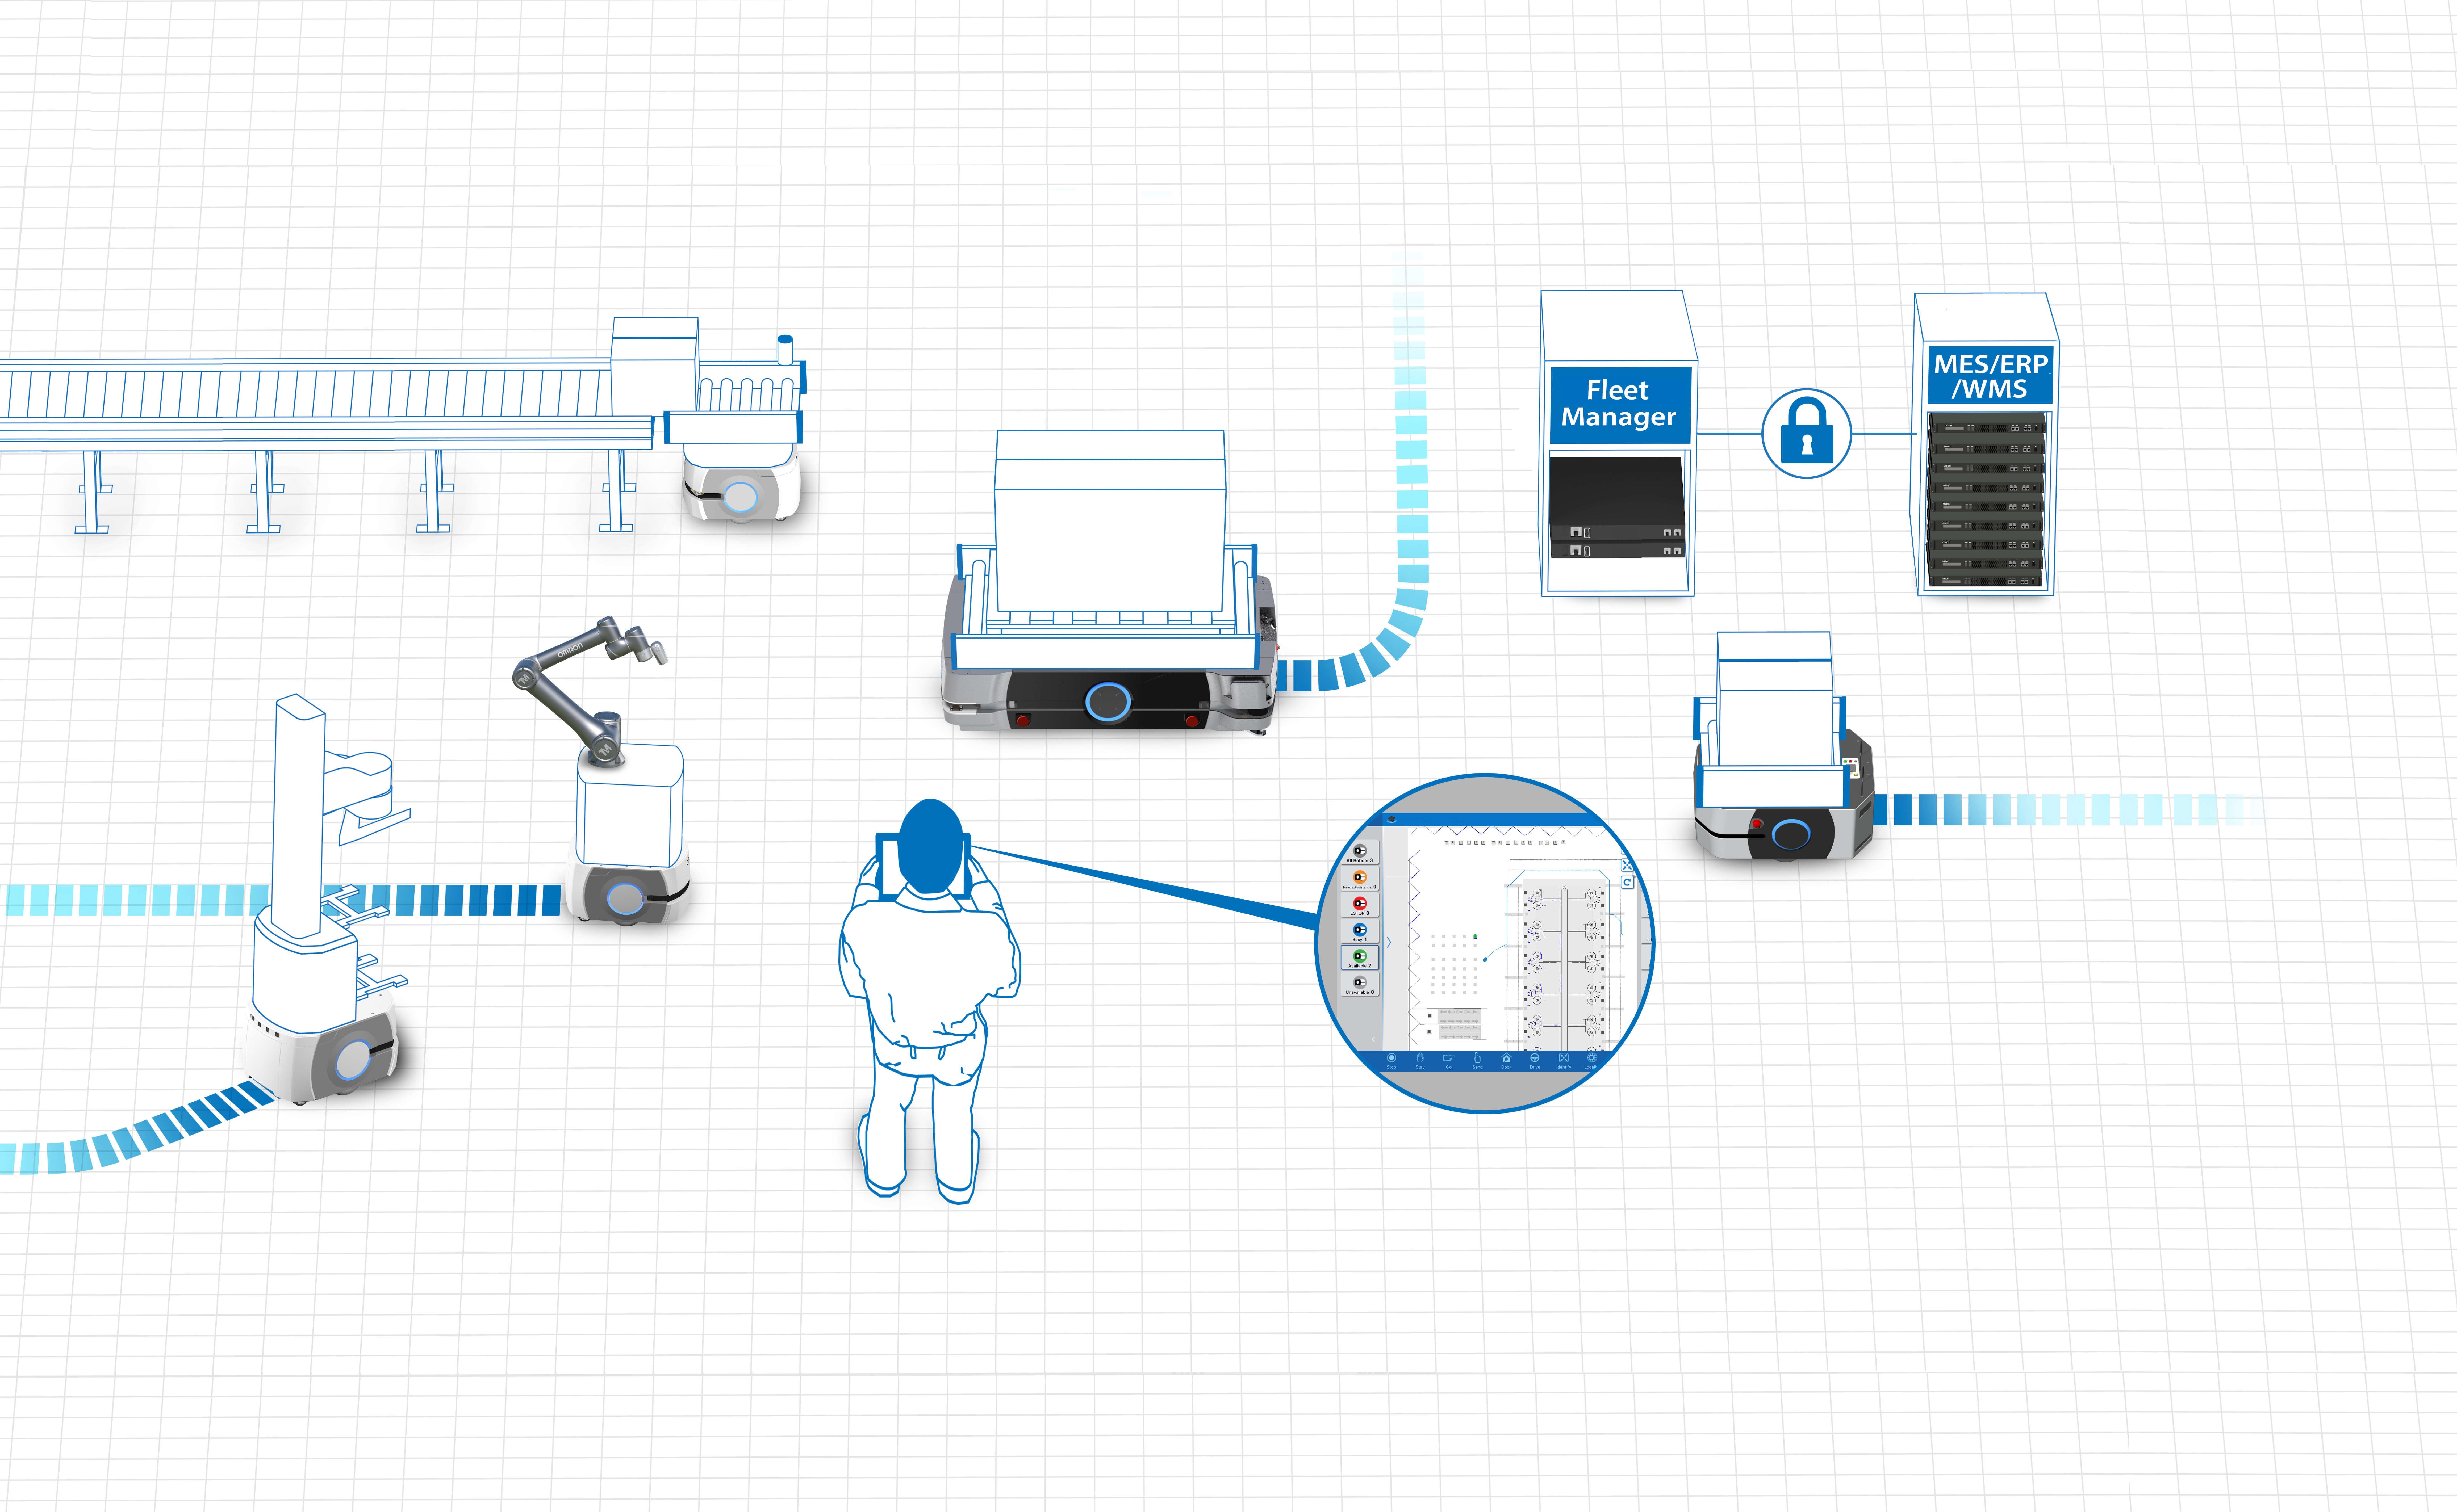 fleetlink-full-mobile-ecosystem-hd-1500 prod